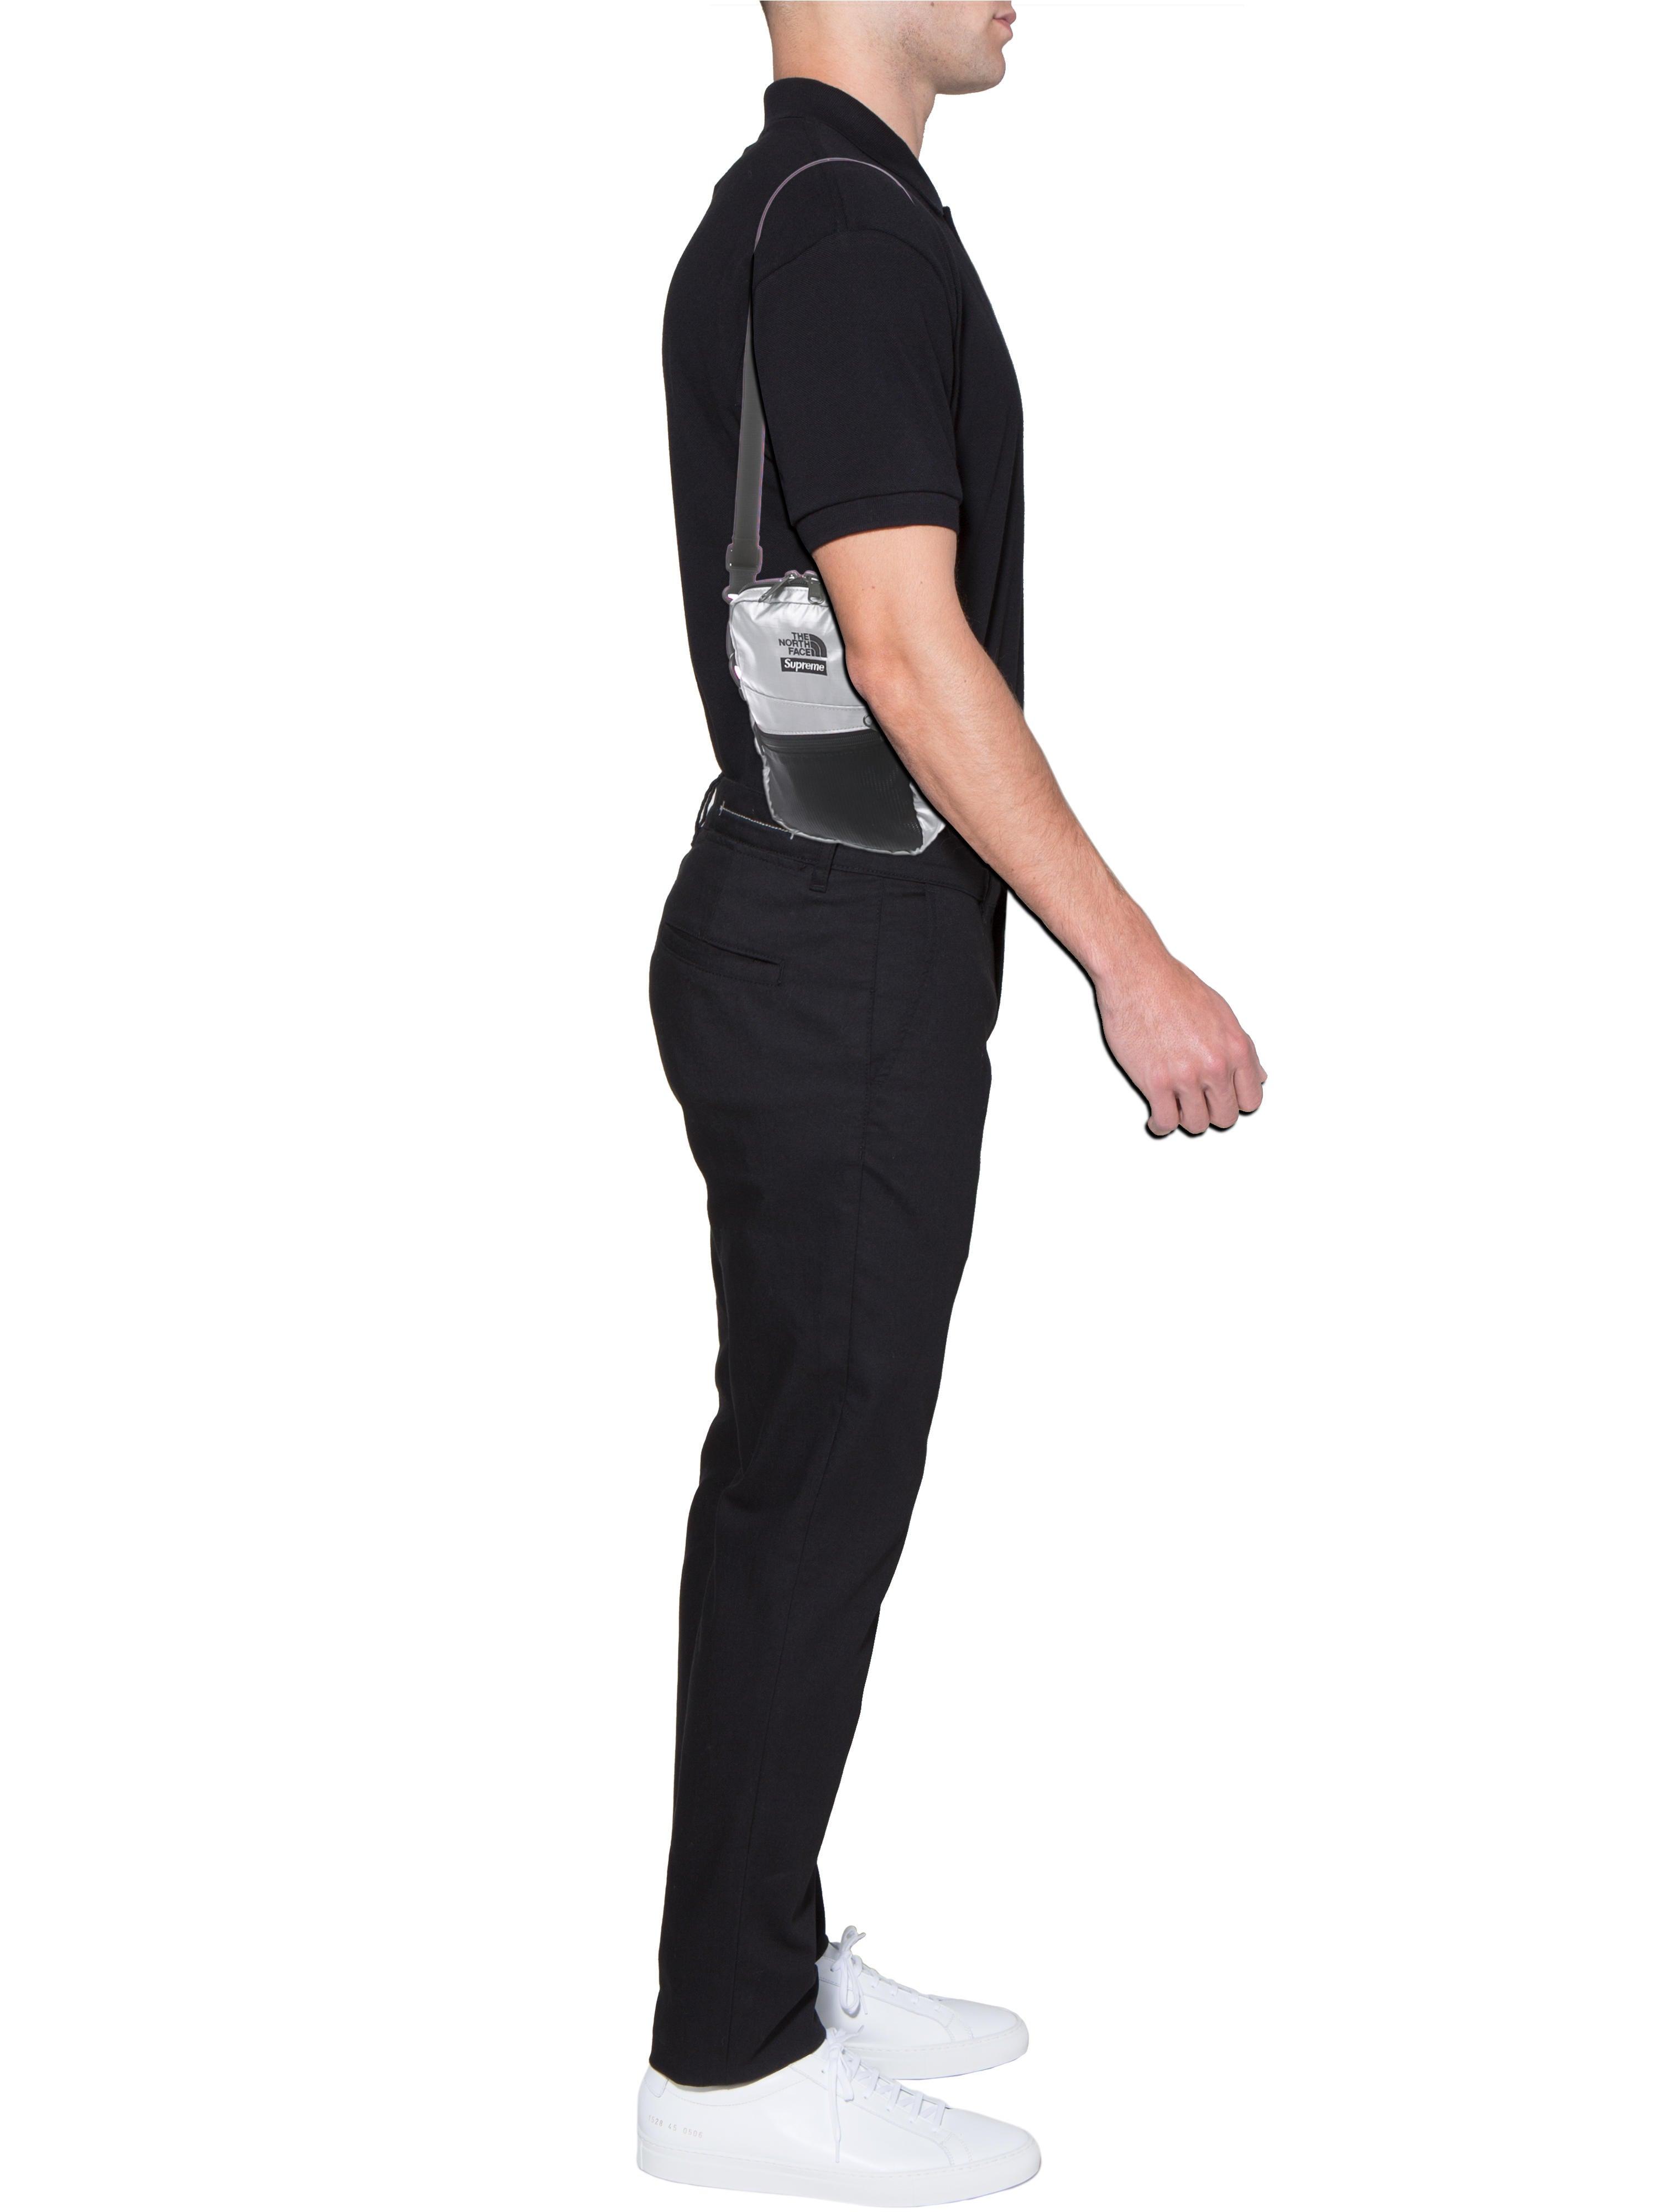 07de86c8 Supreme North Face Shoulder Bag Stockx   The Art of Mike Mignola